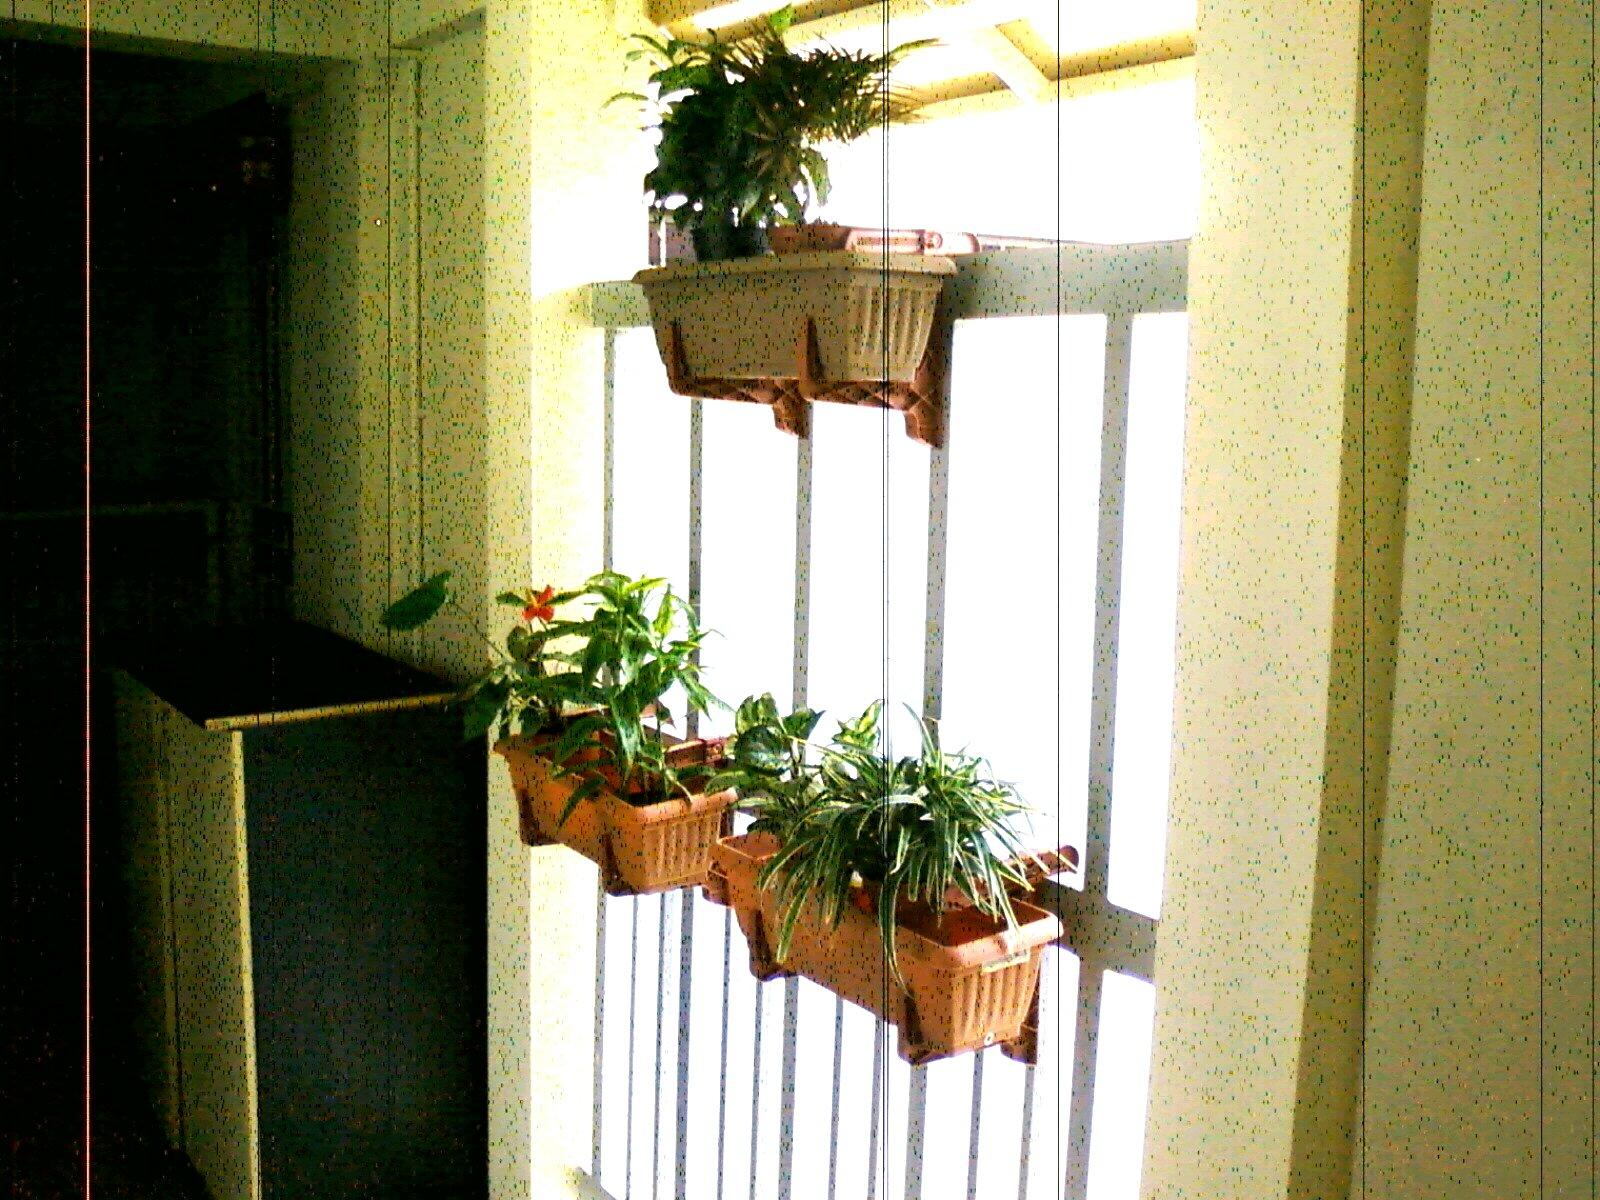 pretty gardens deck rail planter makes great small space gardens. Black Bedroom Furniture Sets. Home Design Ideas